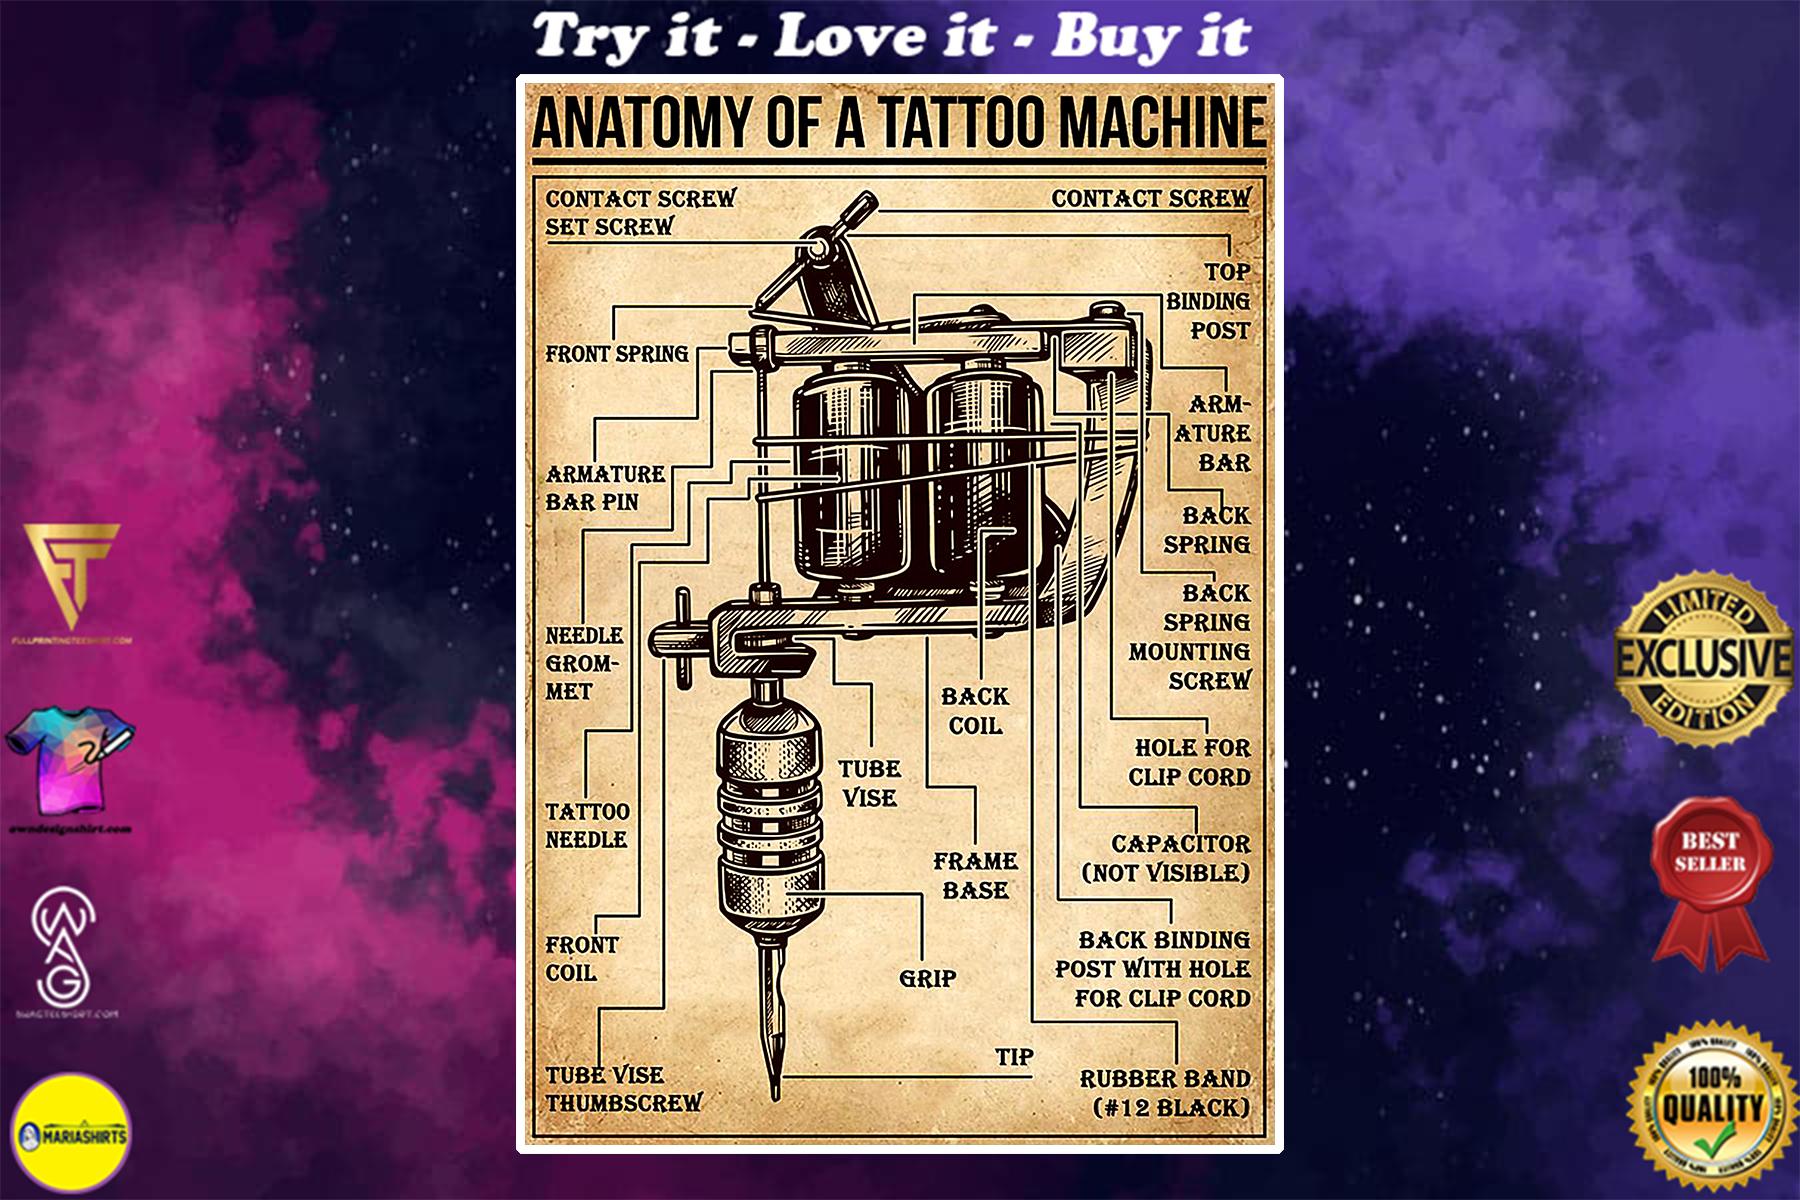 vintage anatomy of a tattoo machine poster